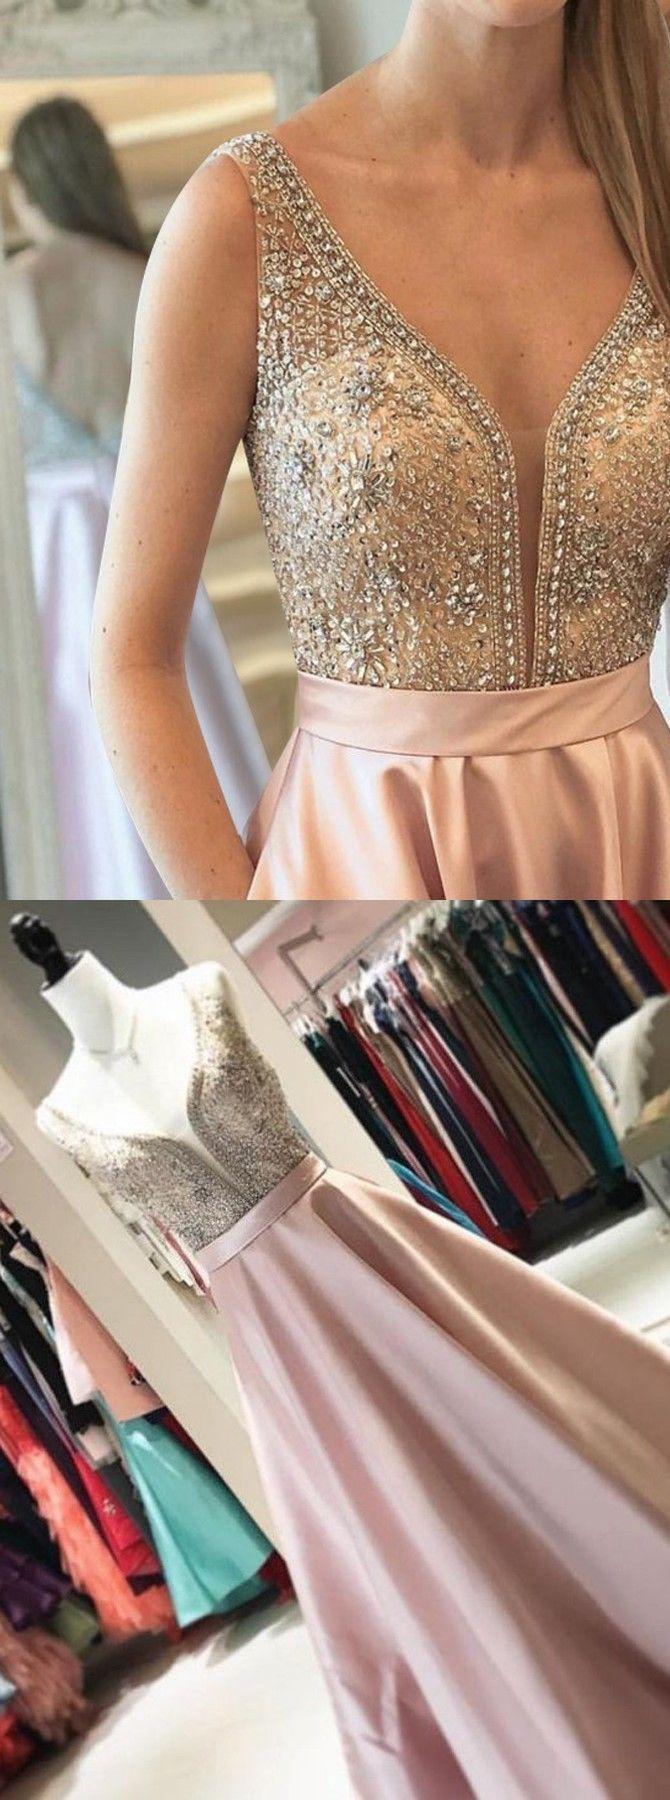 Aline vneck backless champagne satin prom dress with pockets